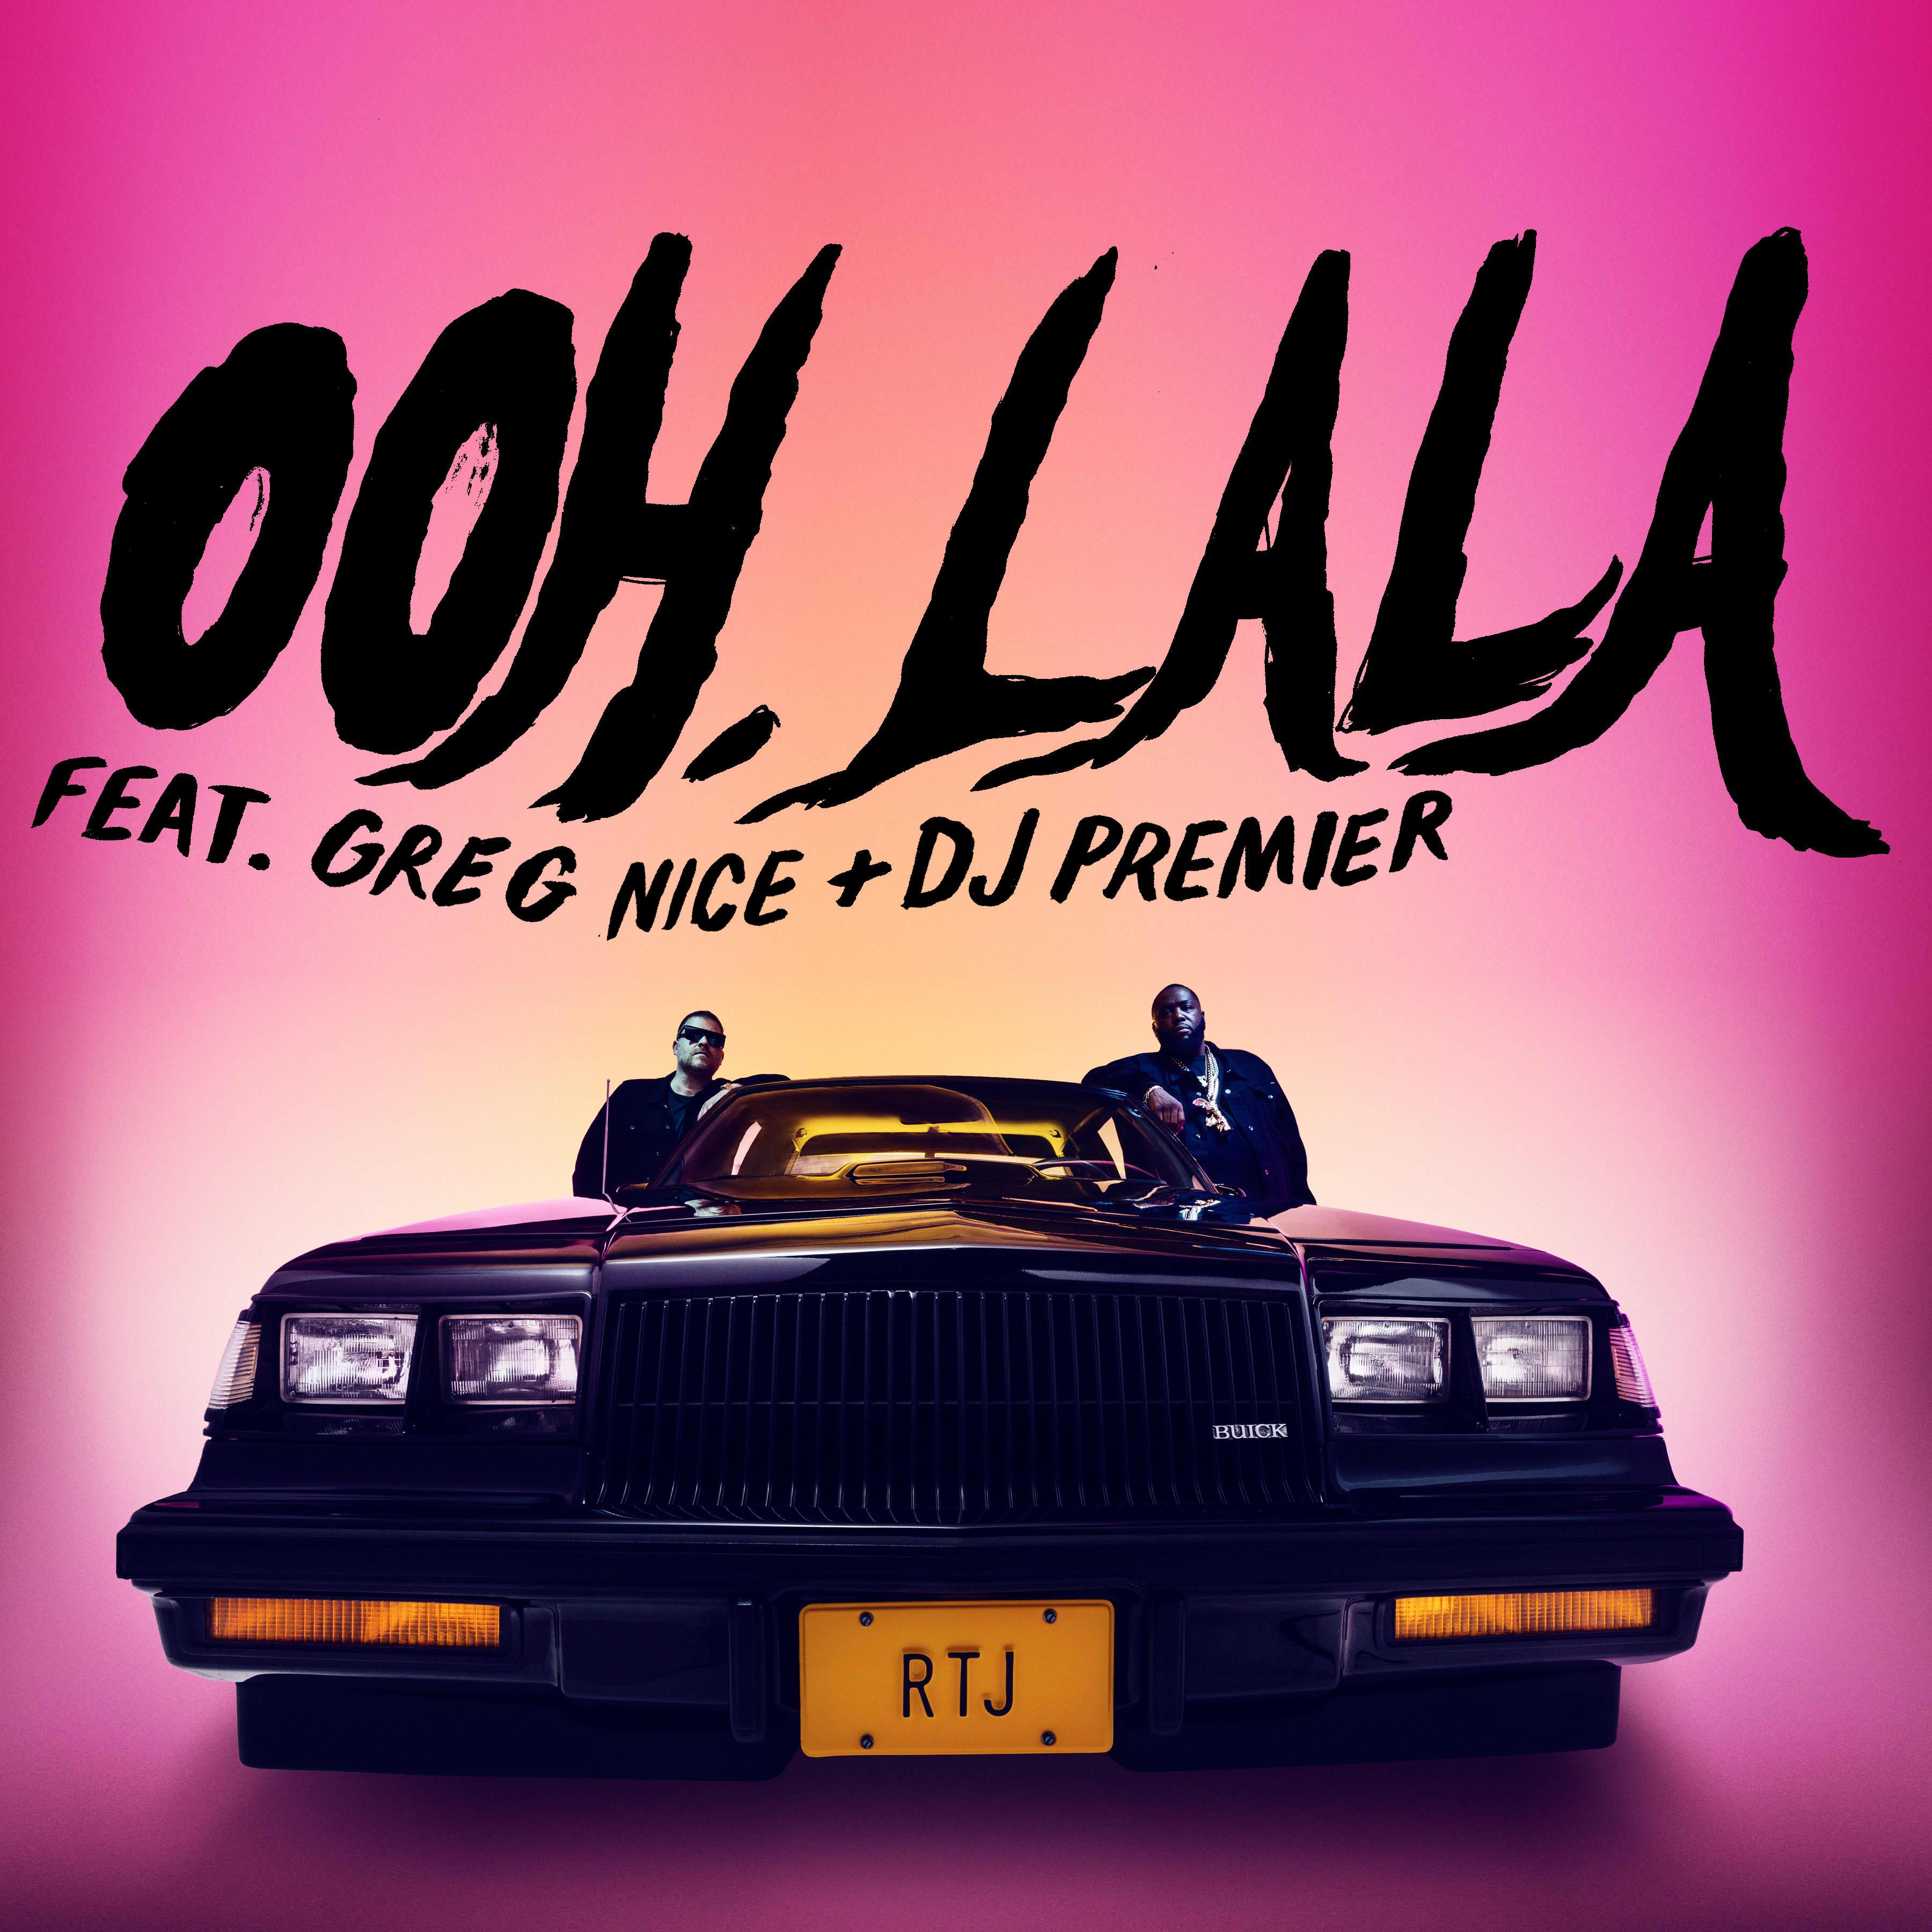 Ohh LA LA (feat. Greg Nice & DJ Premier)